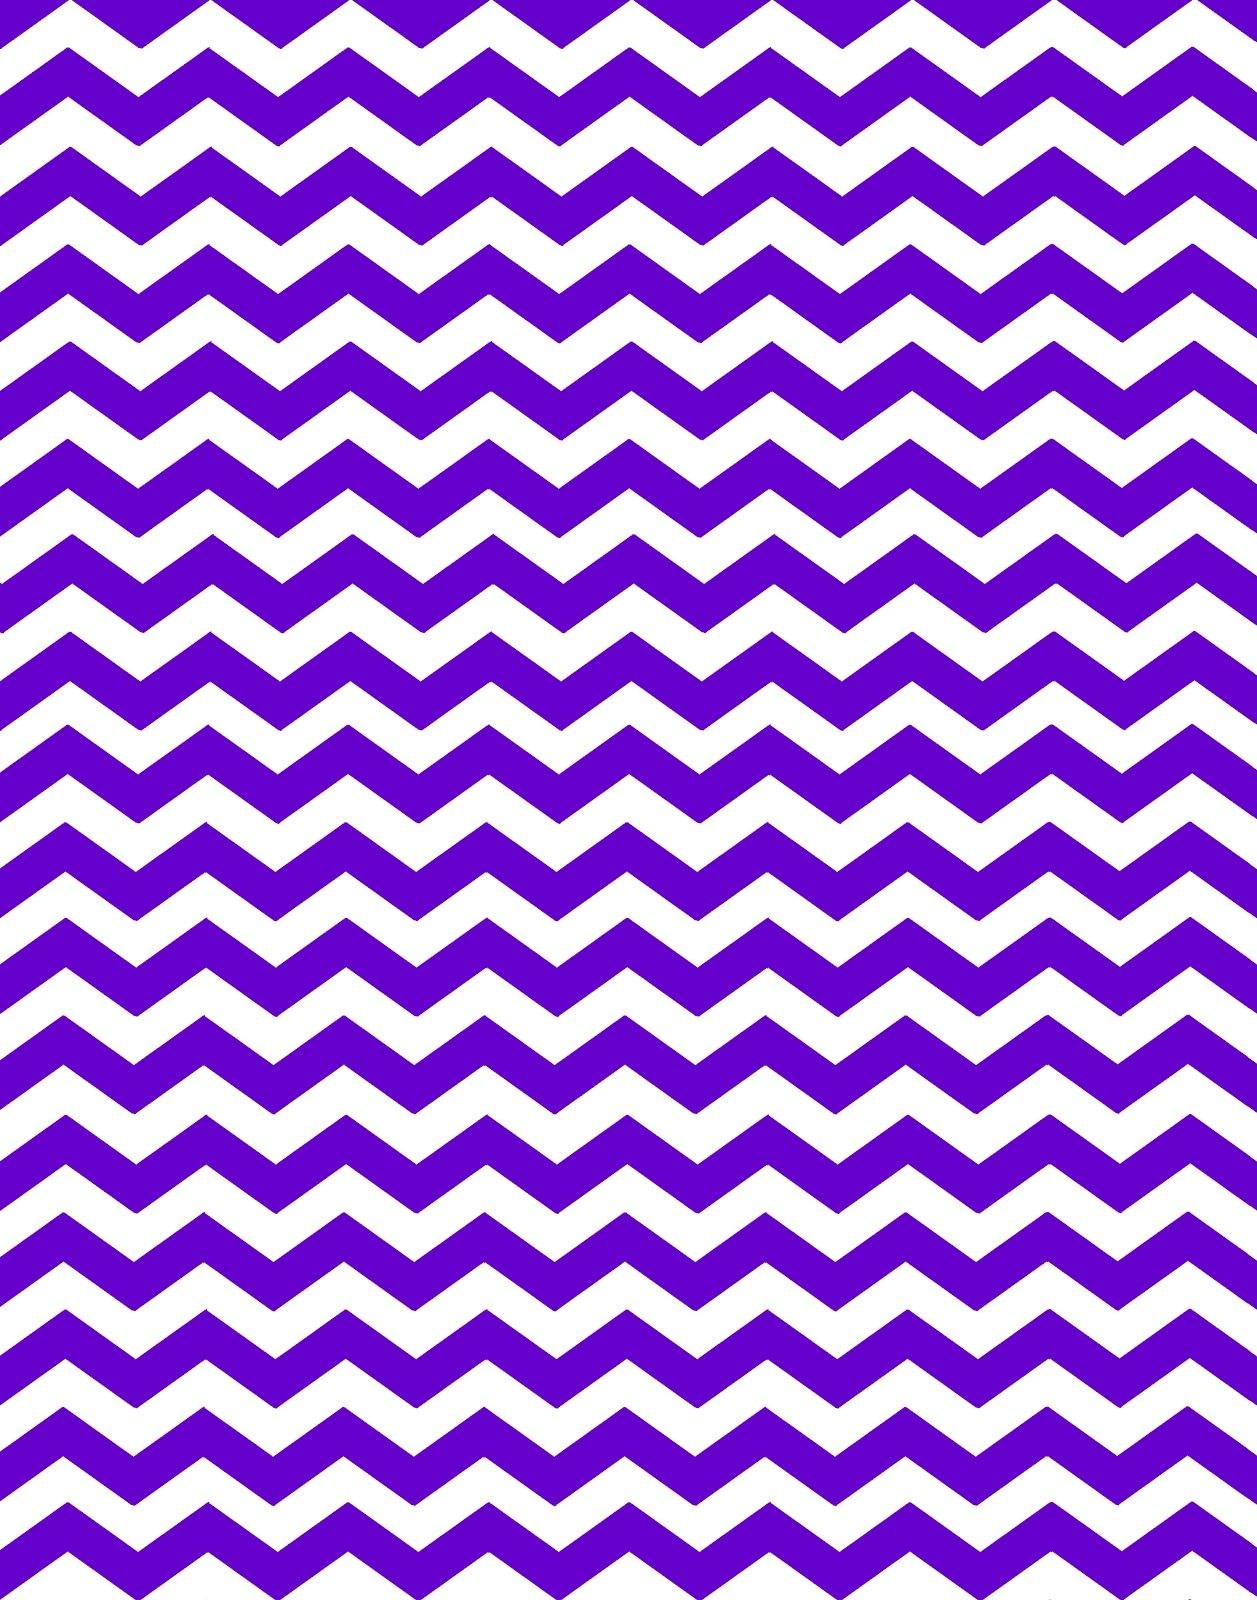 Purple Chevron Background this chevron backround...